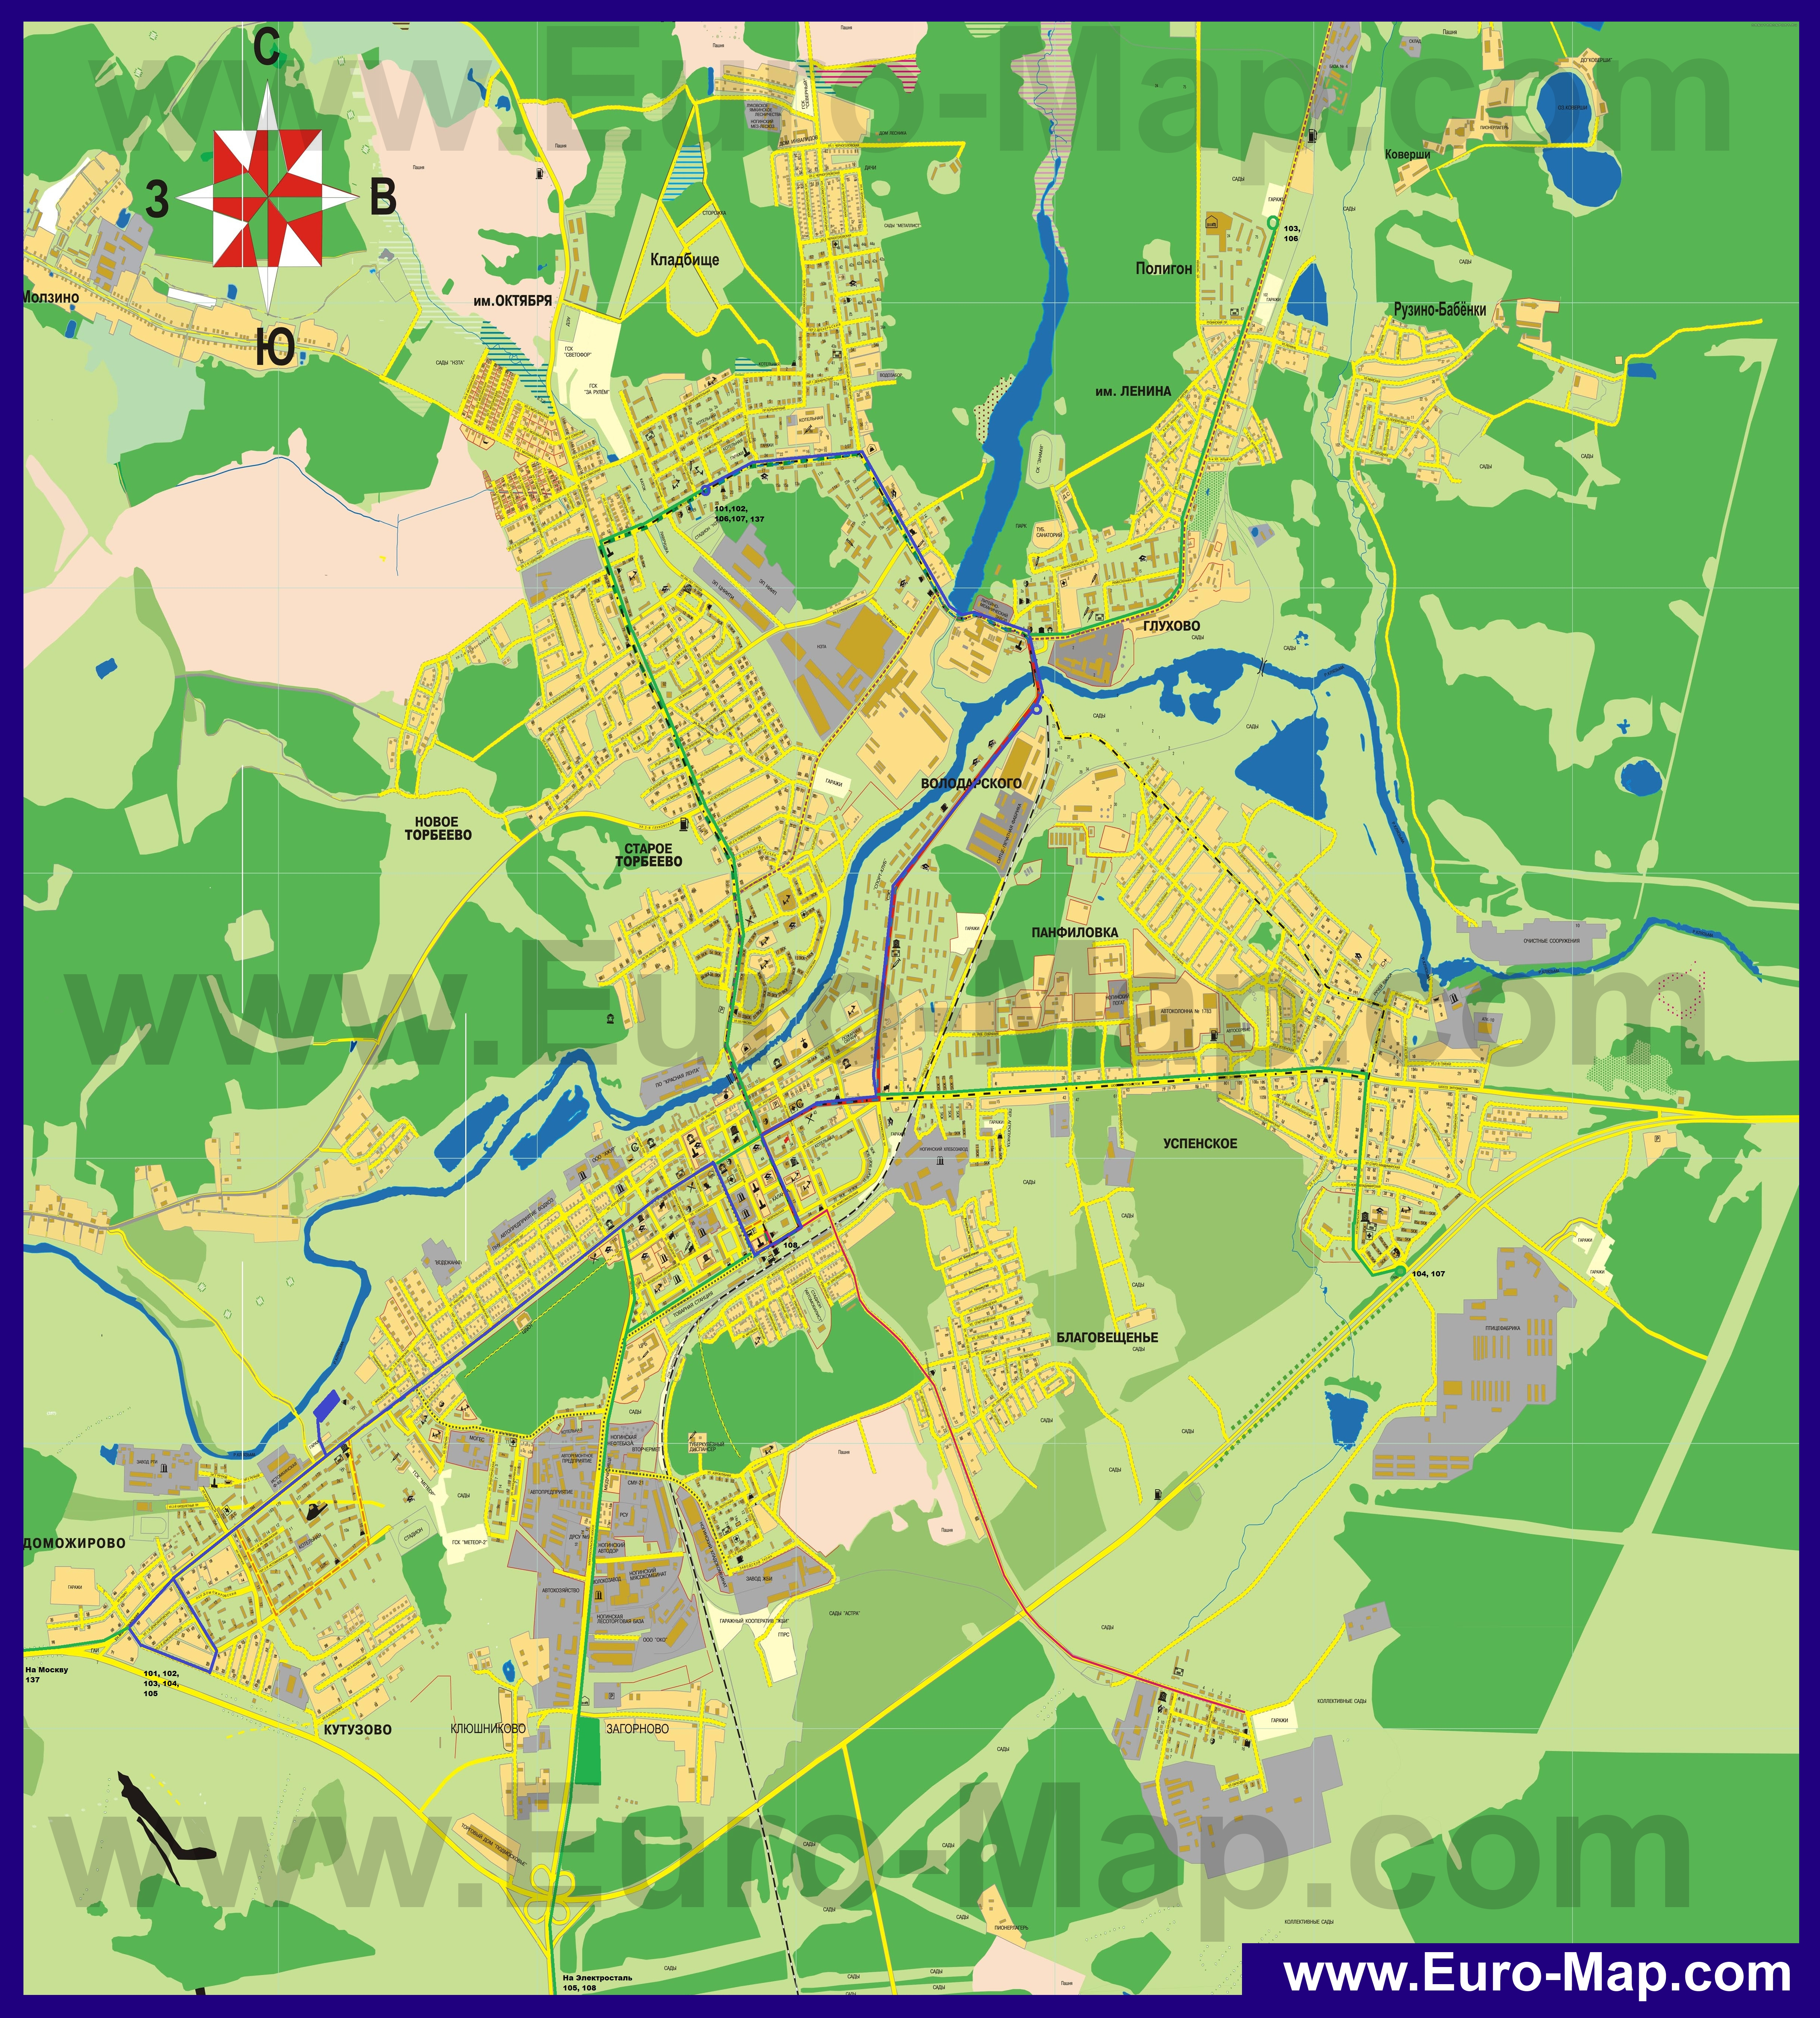 Карта Адлера подробная: районы, названия улиц